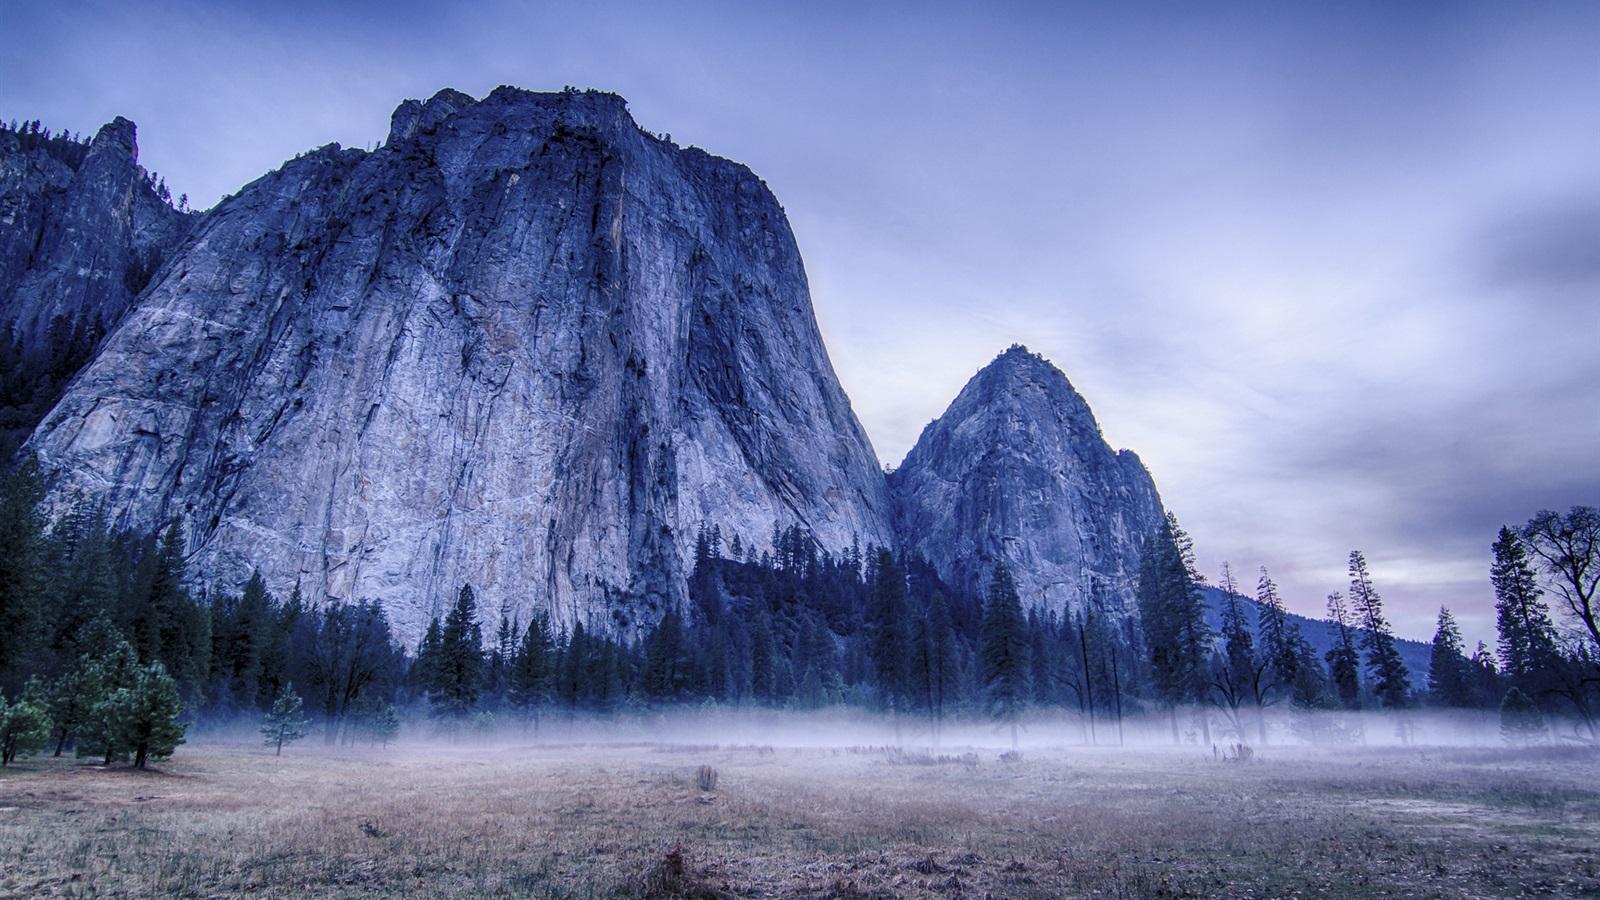 yosemite national park fog - photo #22